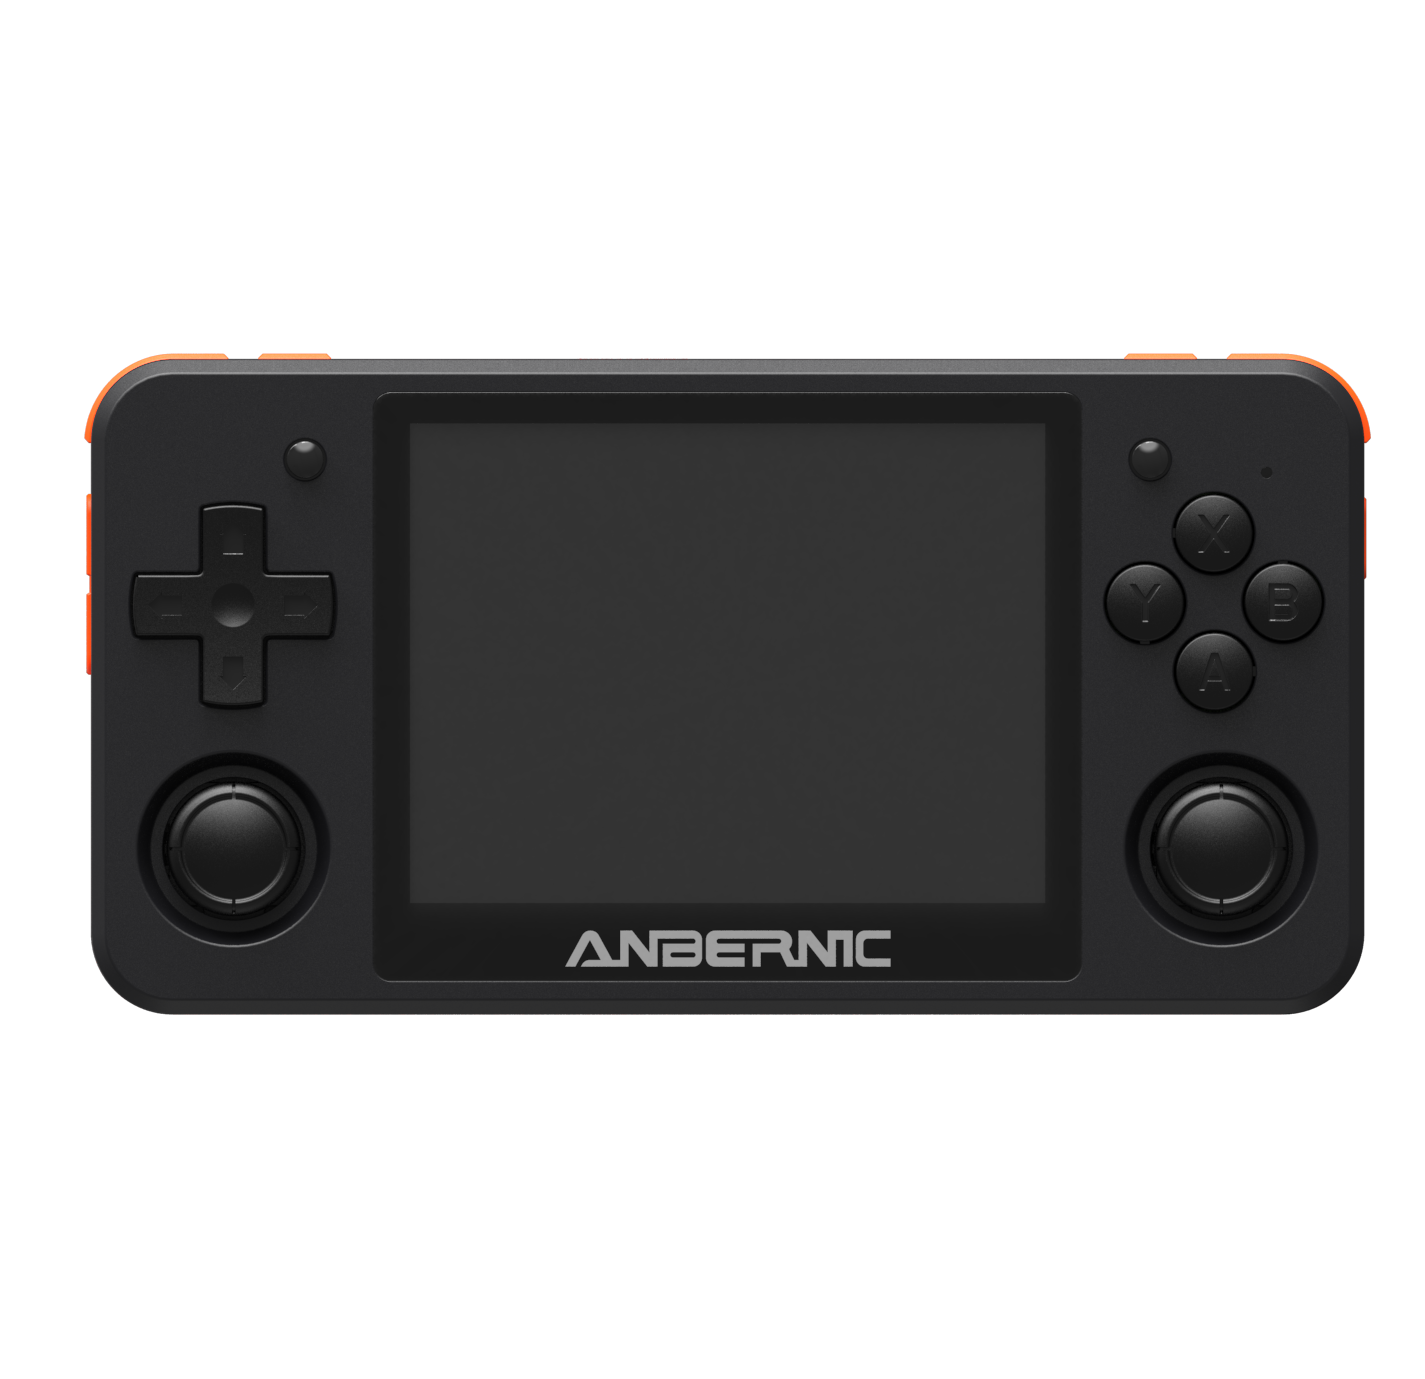 NEW RG350P ANBERNIC Retro Game Console 3.5